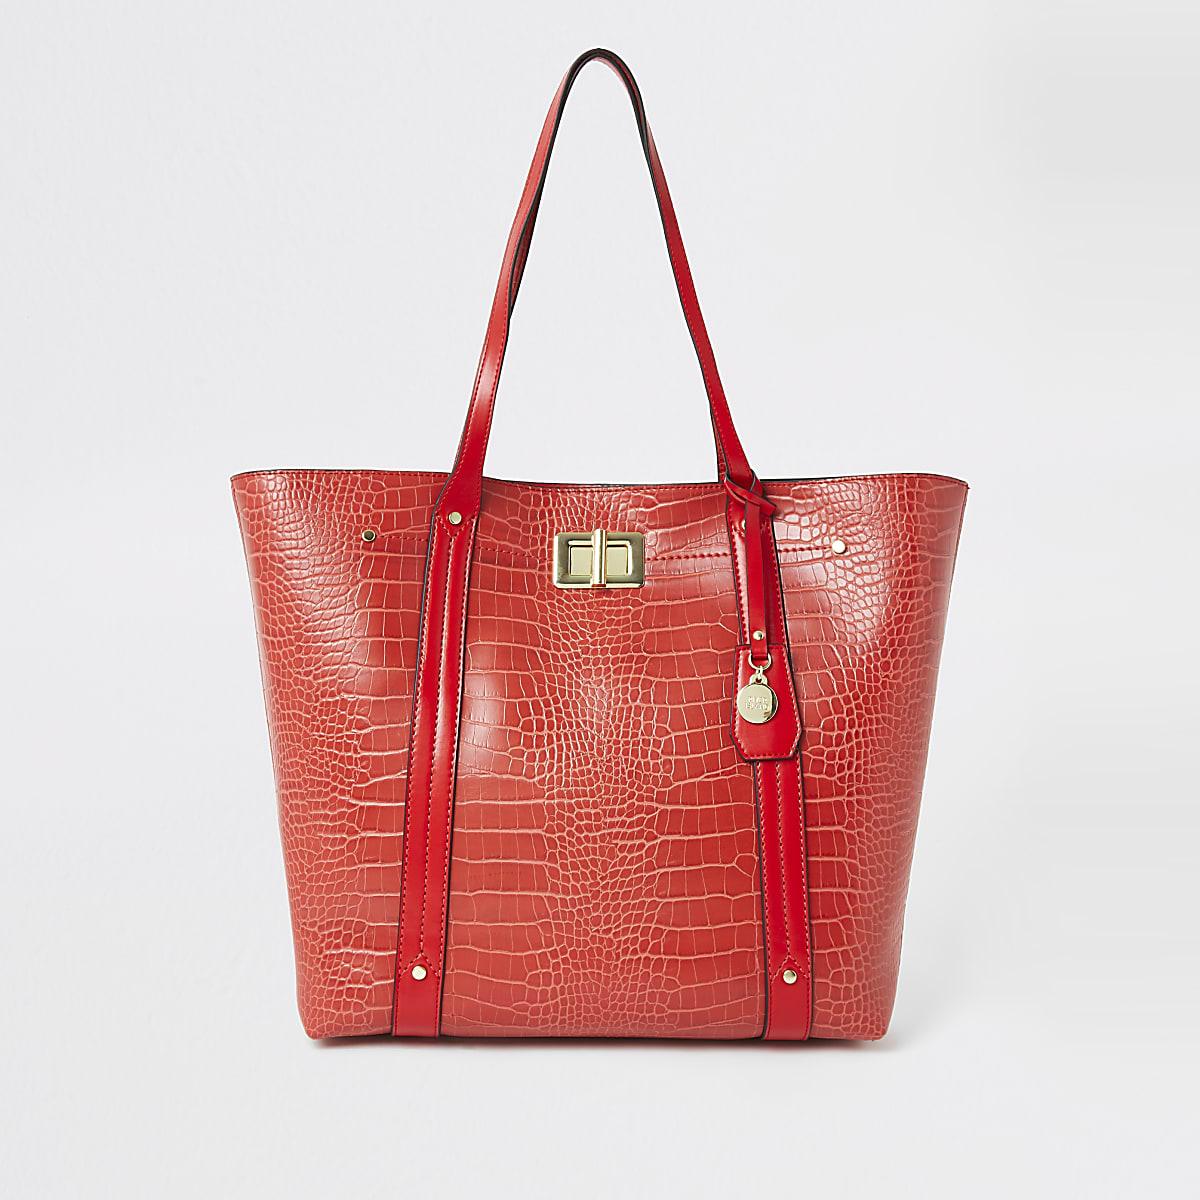 Red croc embossed shopper tote bag